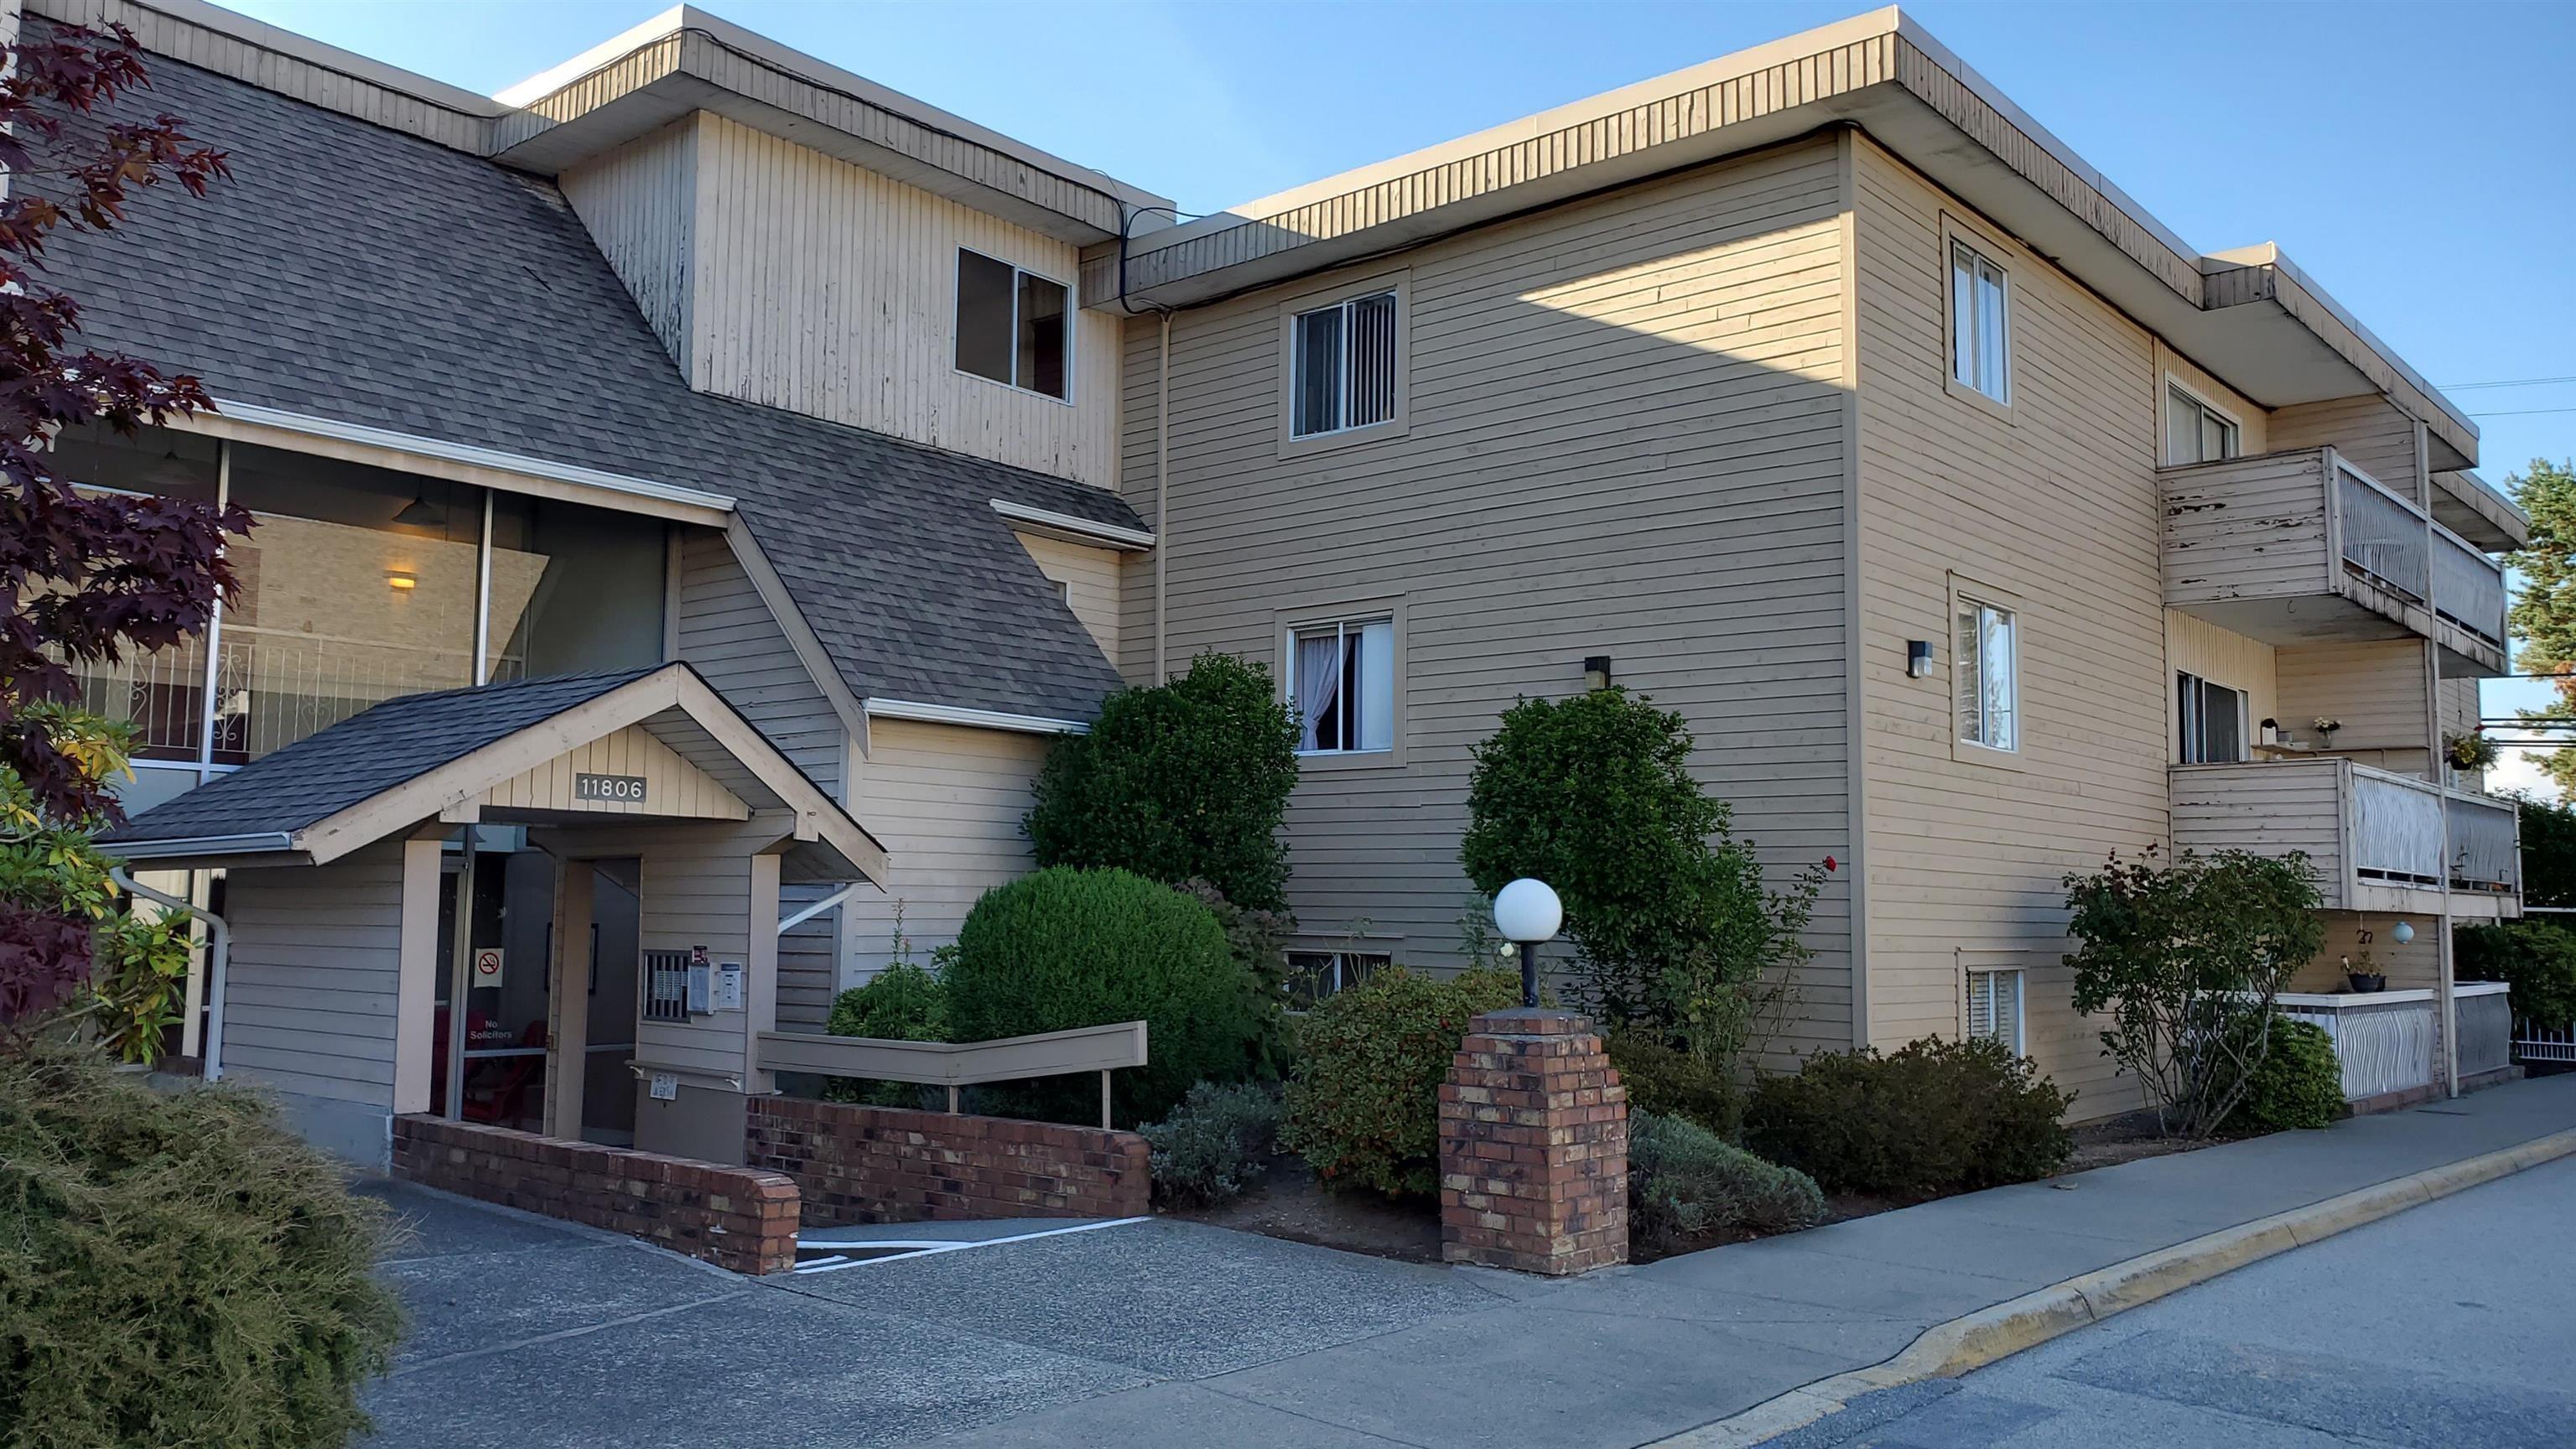 120 11806 88 AVENUE - Annieville Apartment/Condo for sale, 2 Bedrooms (R2616862)